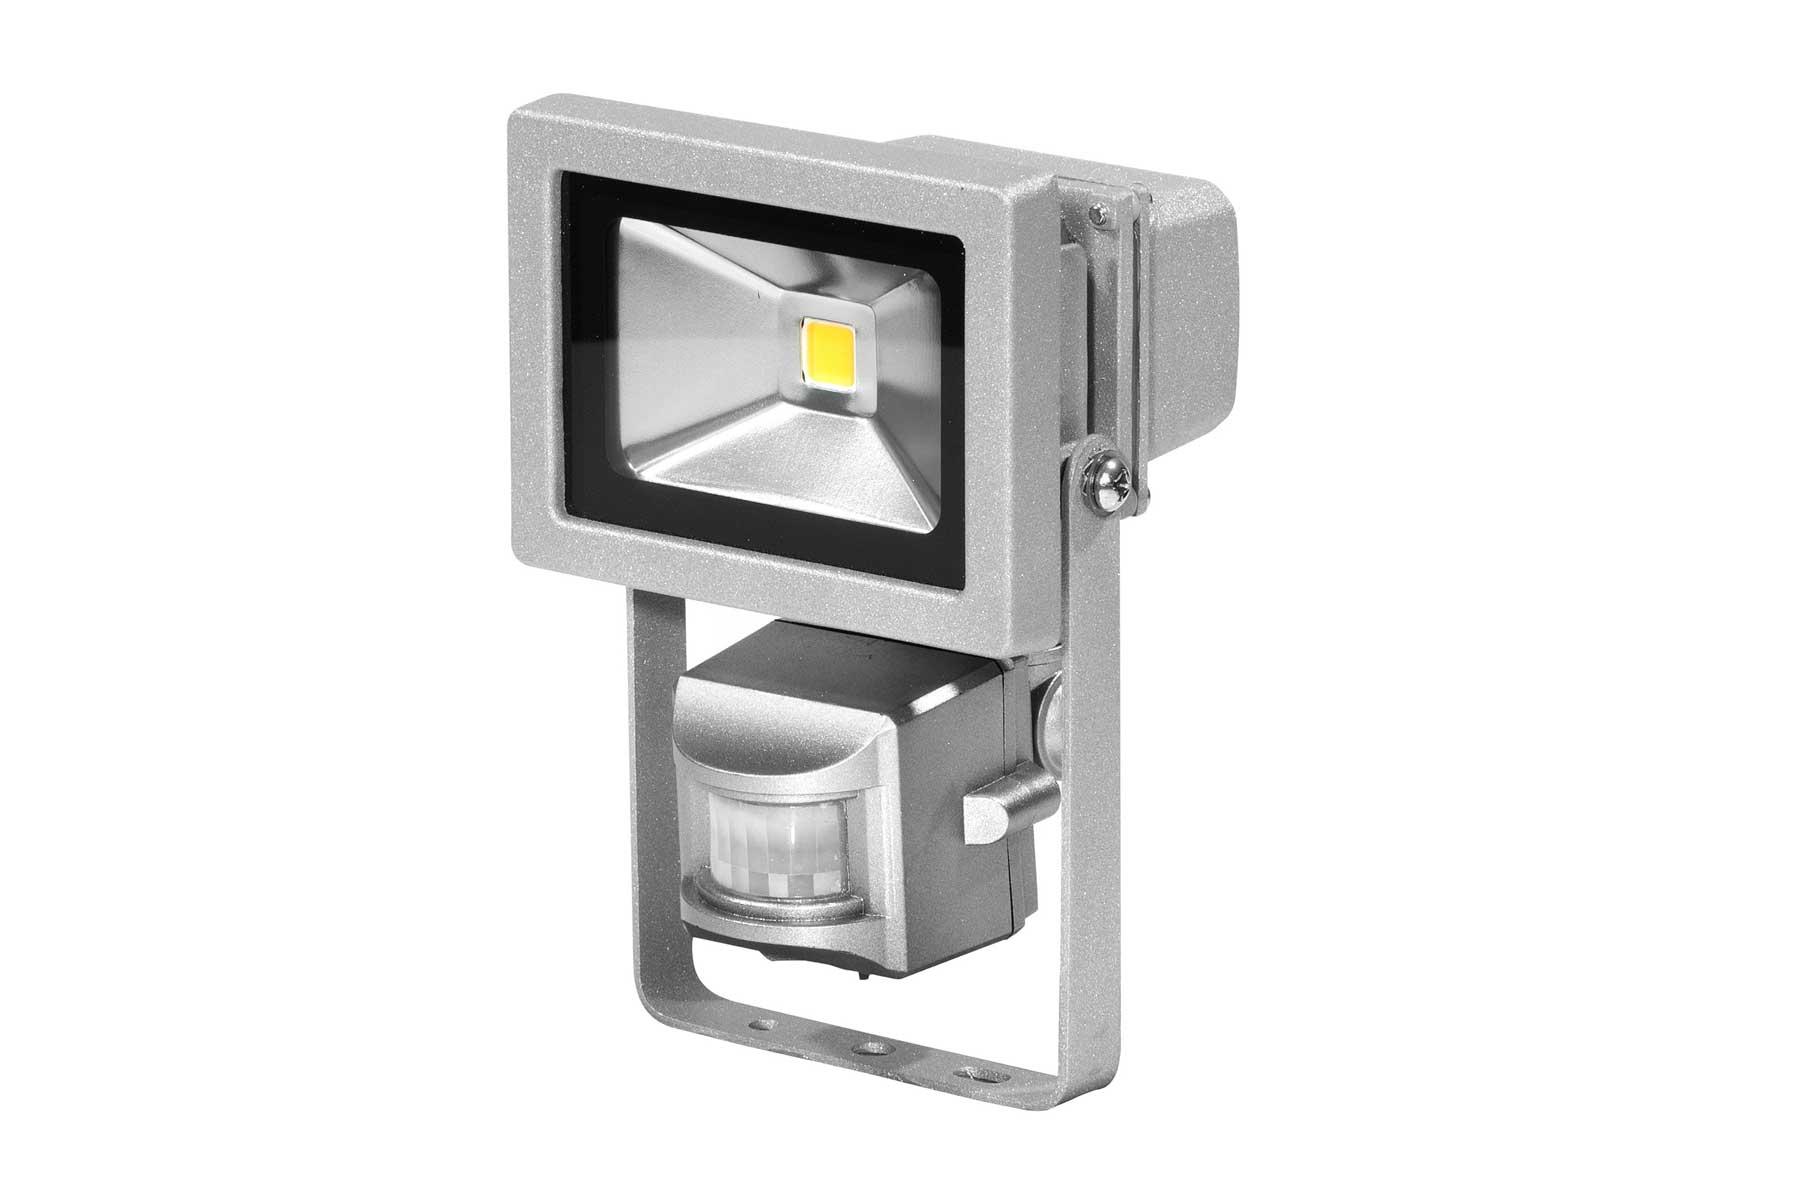 360 Grad Produktfotografie Konstanz _ Packshot Sensorlampe